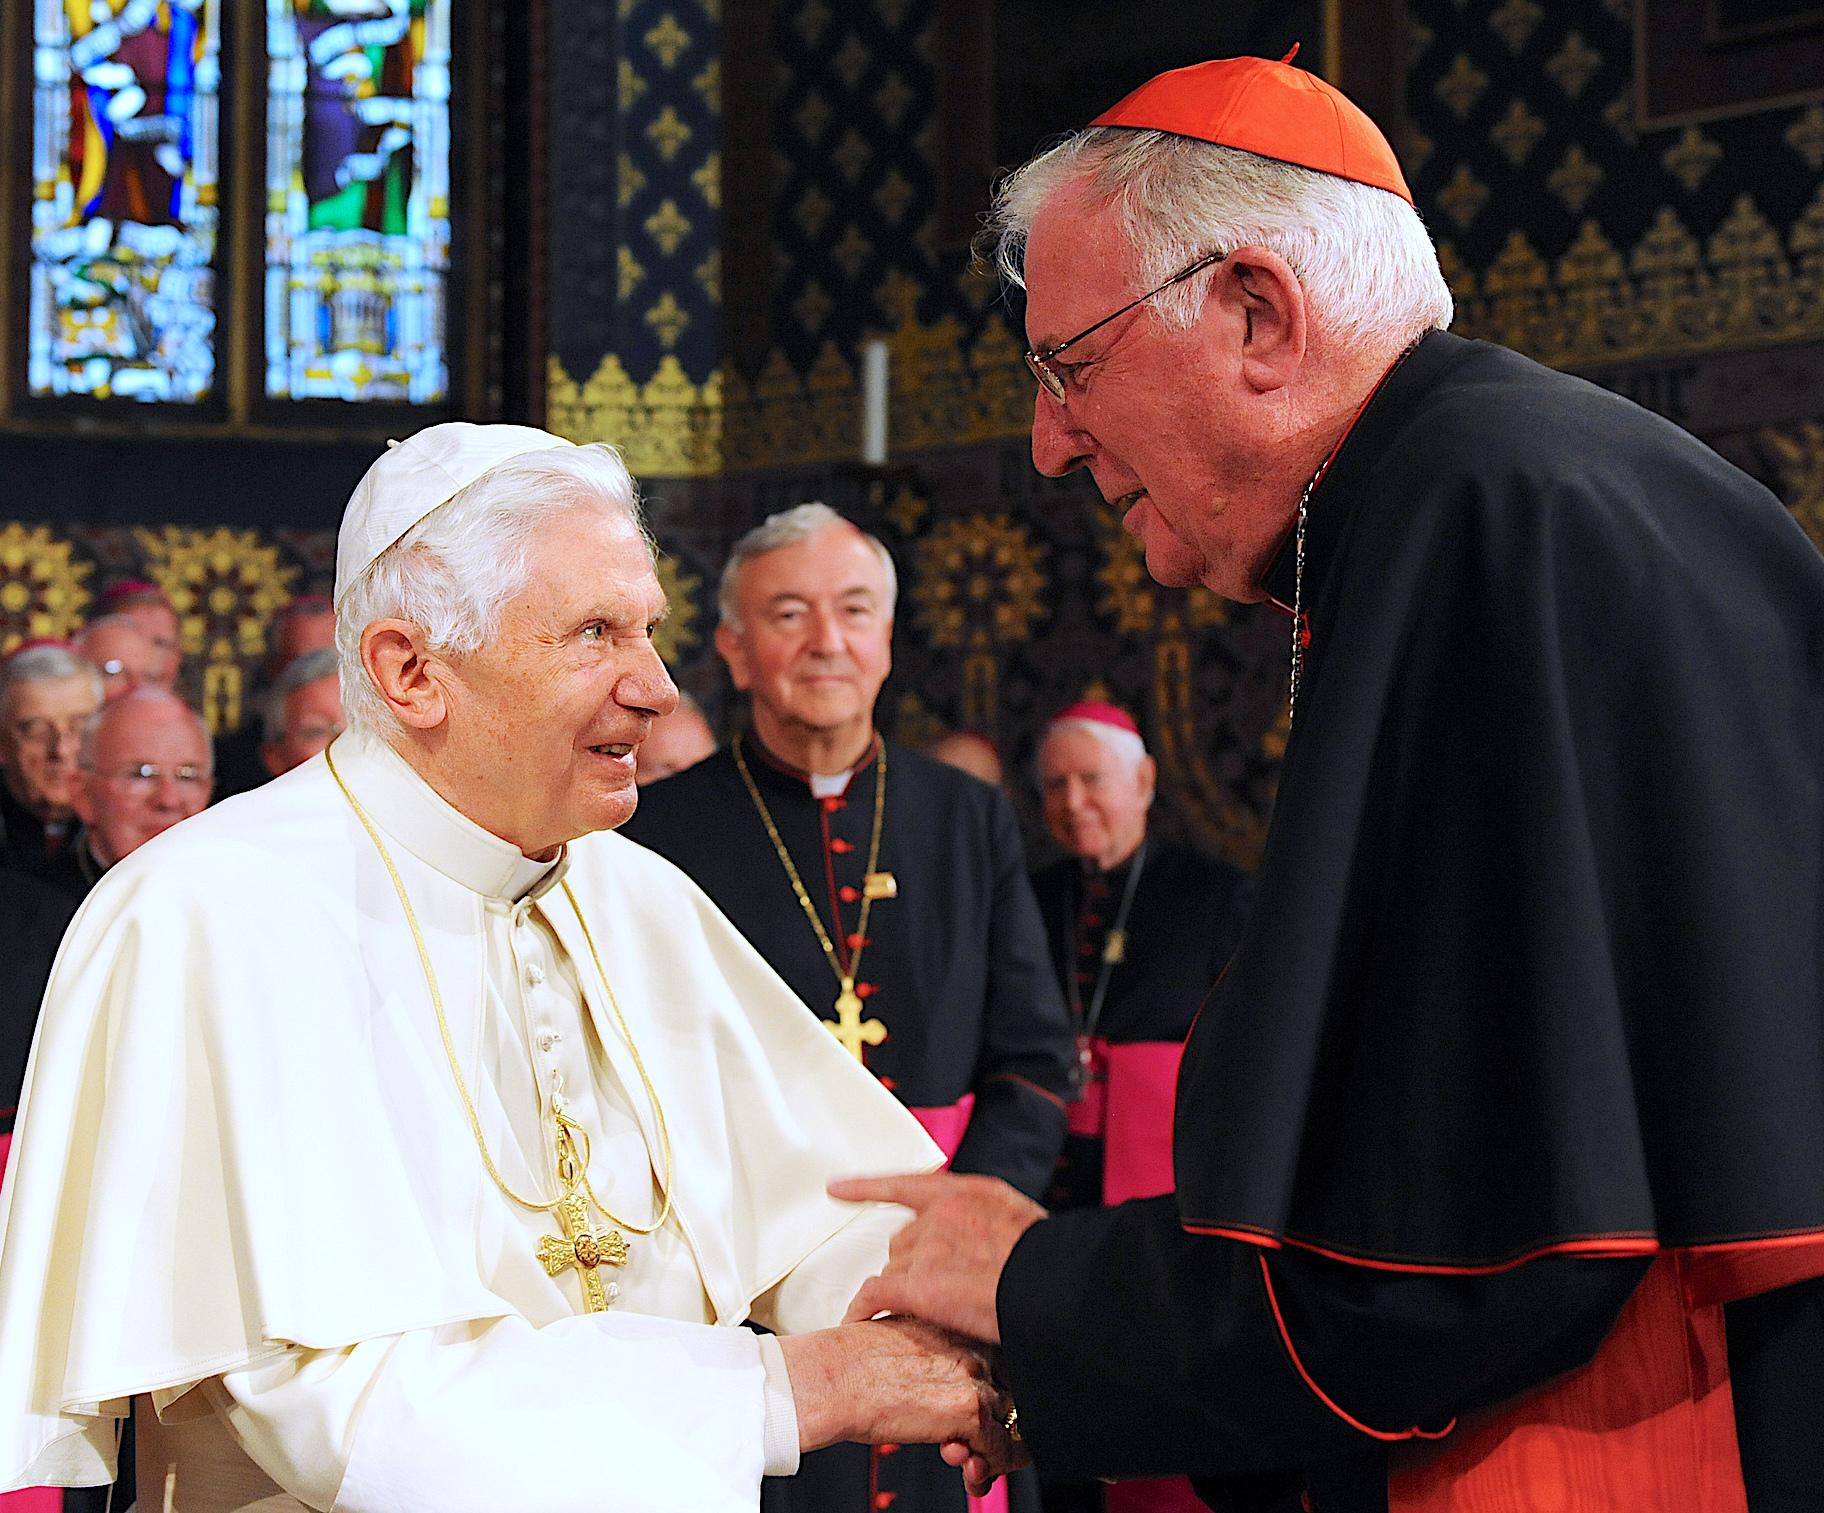 El cardenal Cormac Murphy-O'Connor con Benedicto XVI.jpg